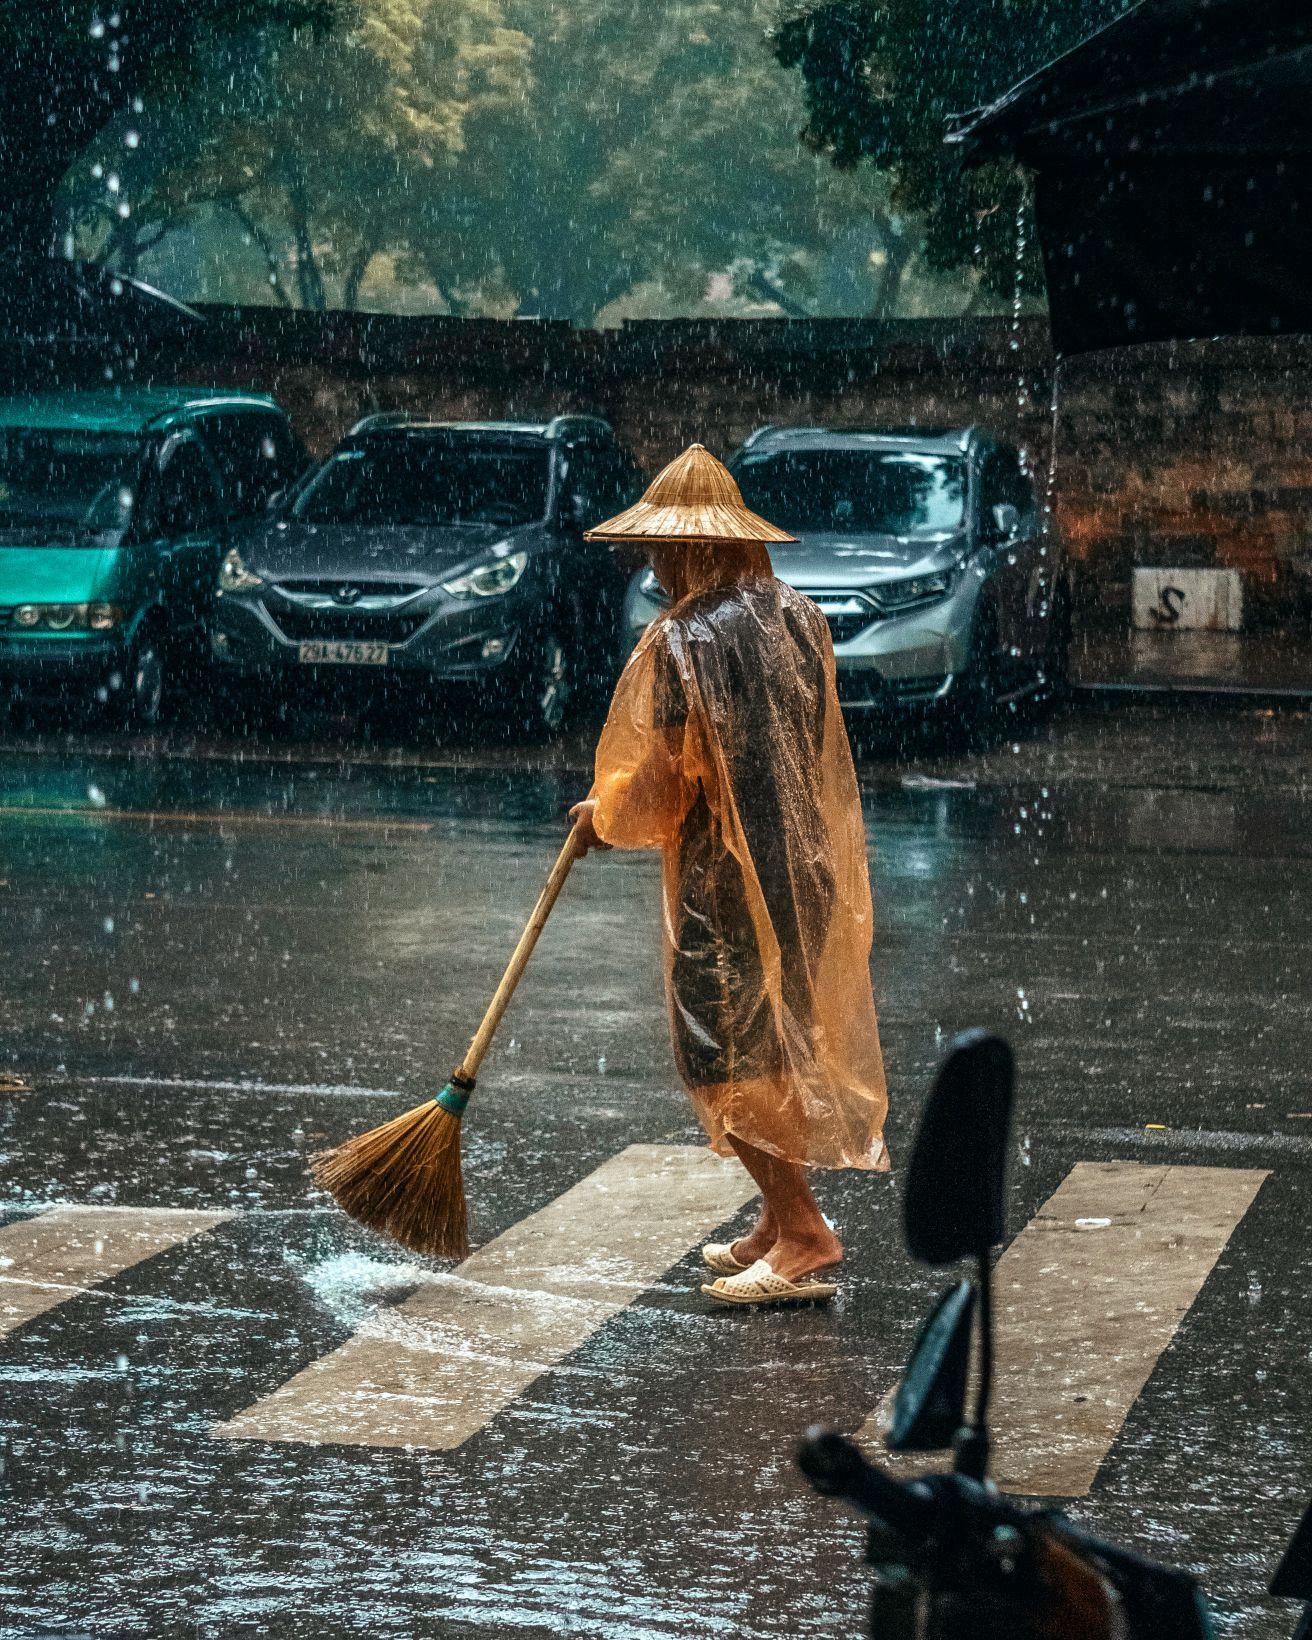 Unpredictable rain in July in Hanoi